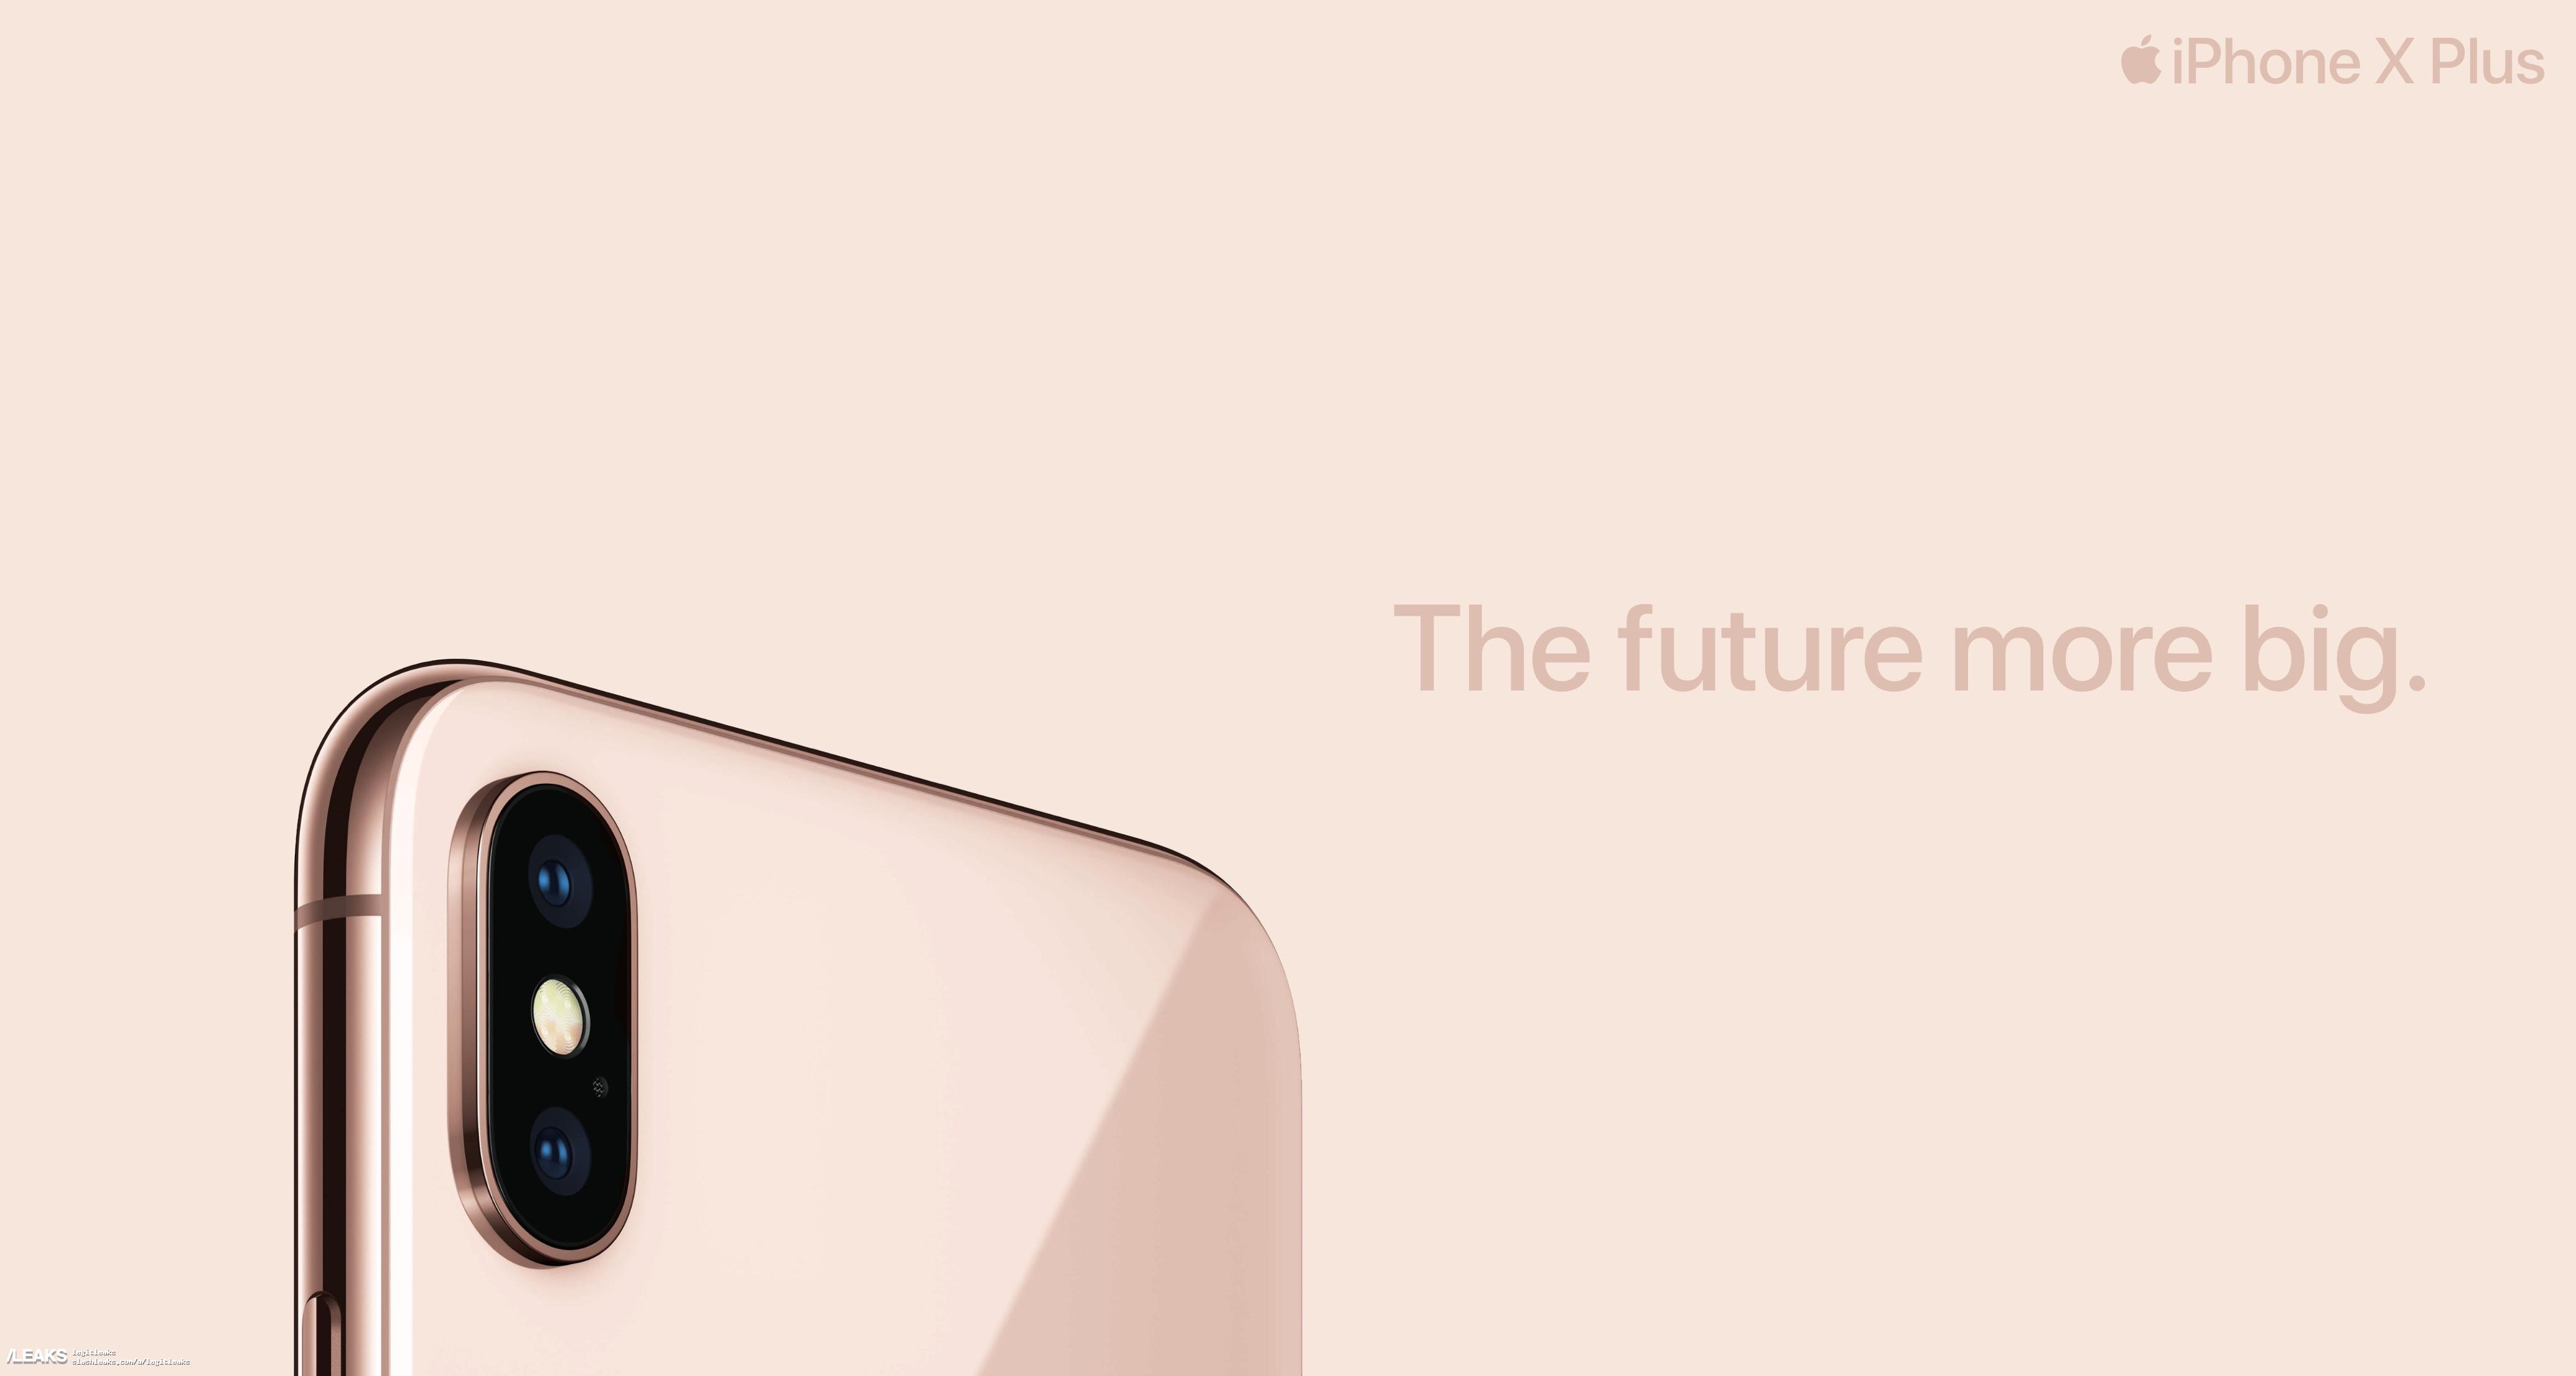 img iPhone X Plus ads reveals gold finish